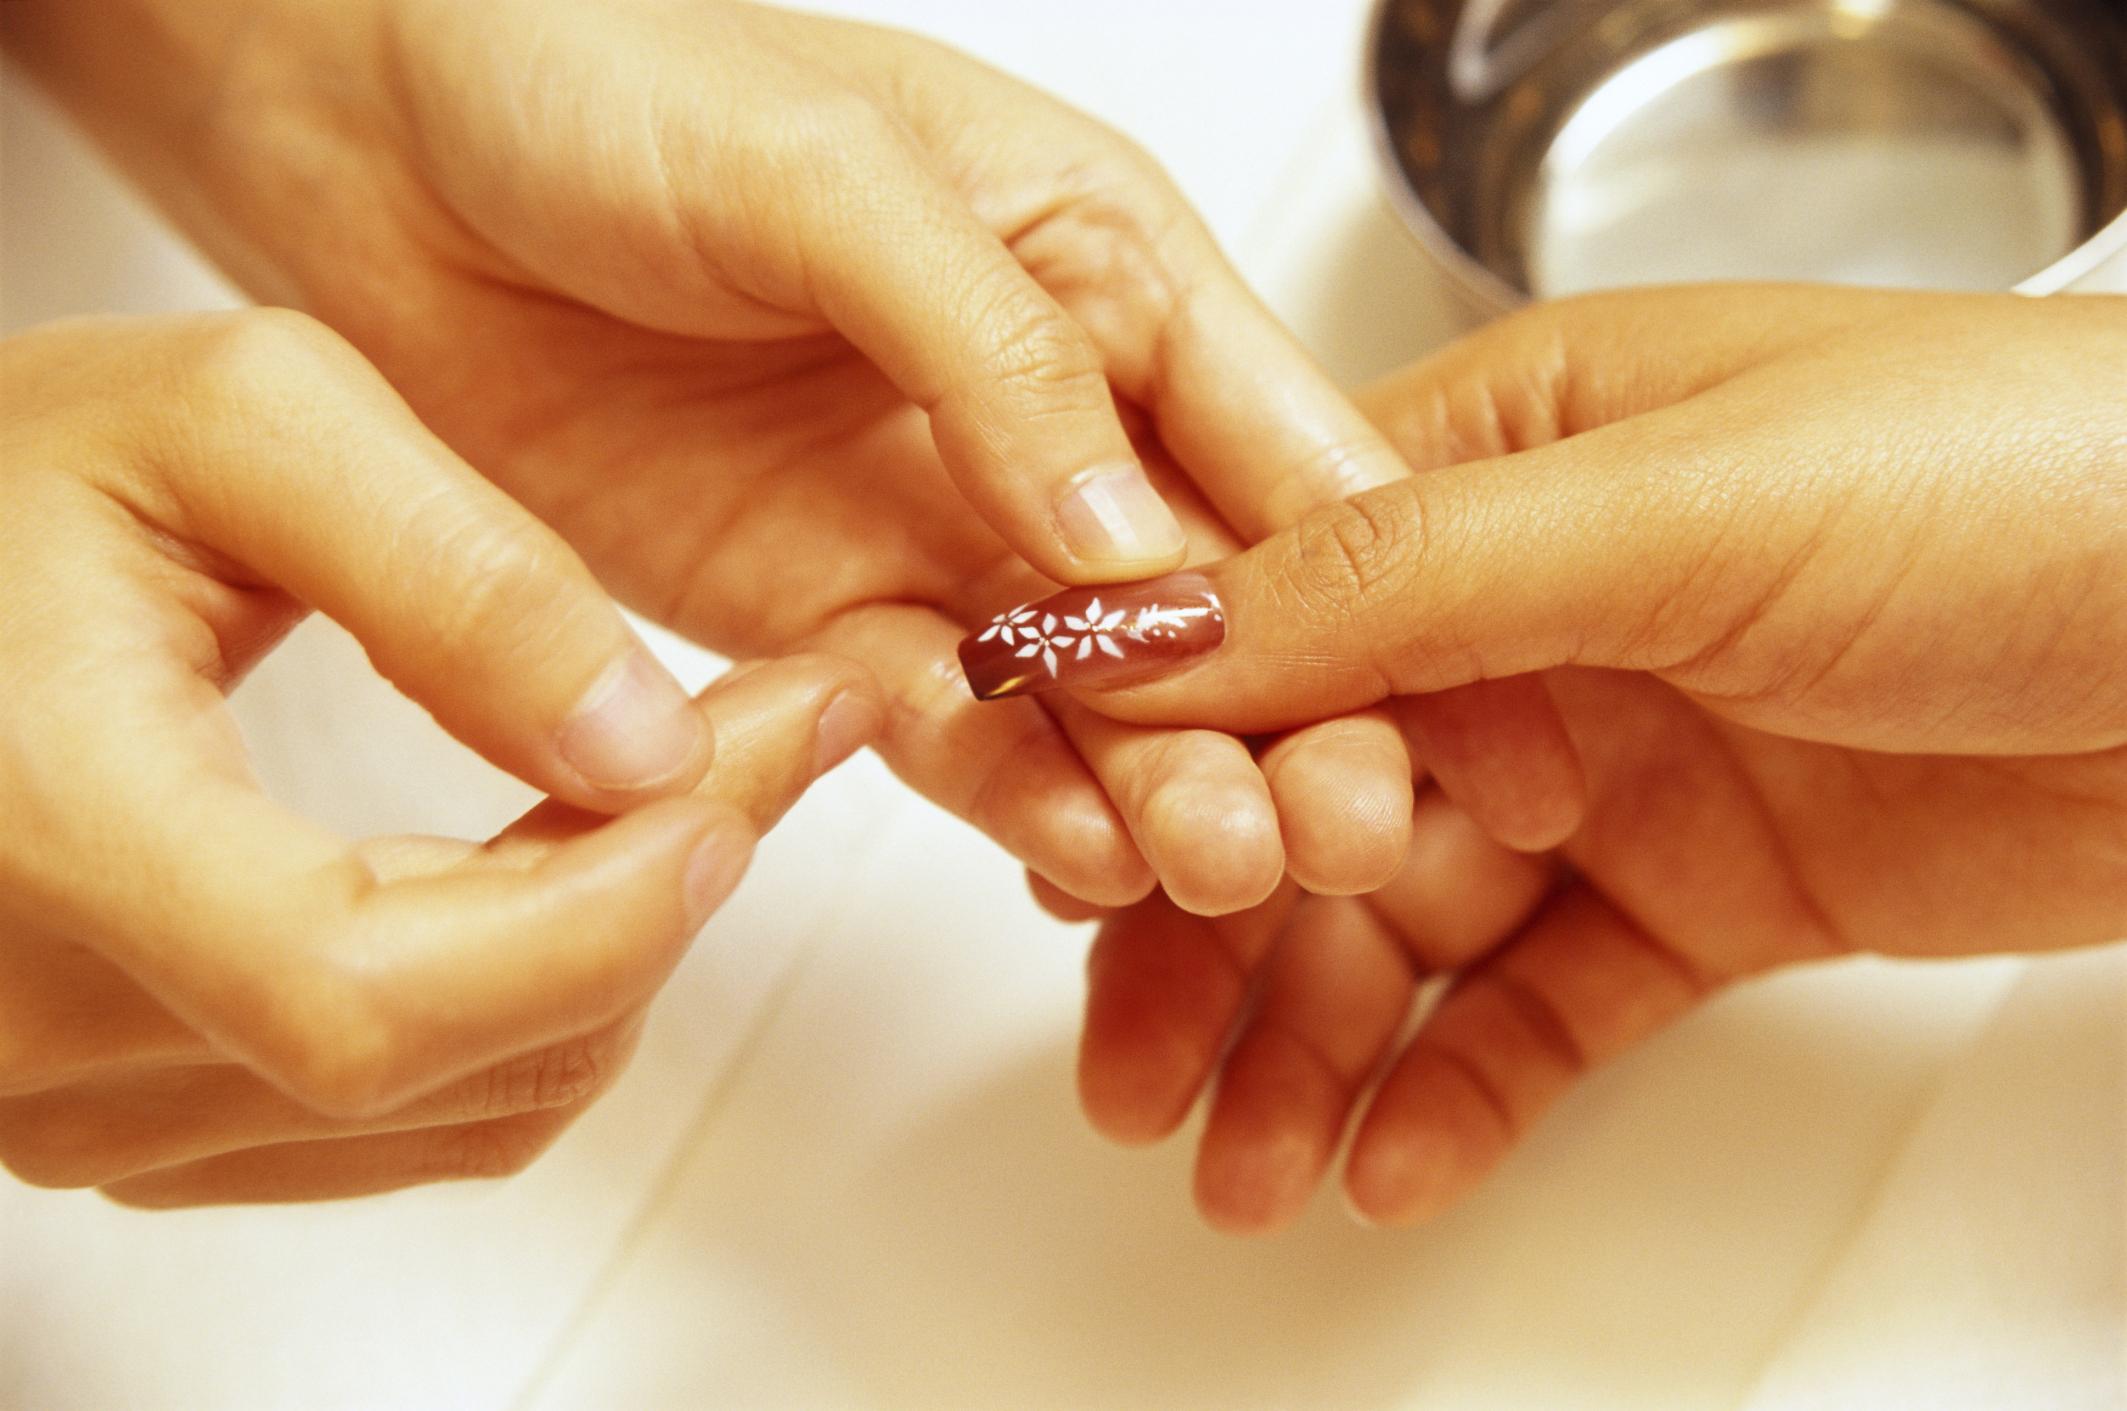 Acrylic Nails & Toxins | LIVESTRONG.COM